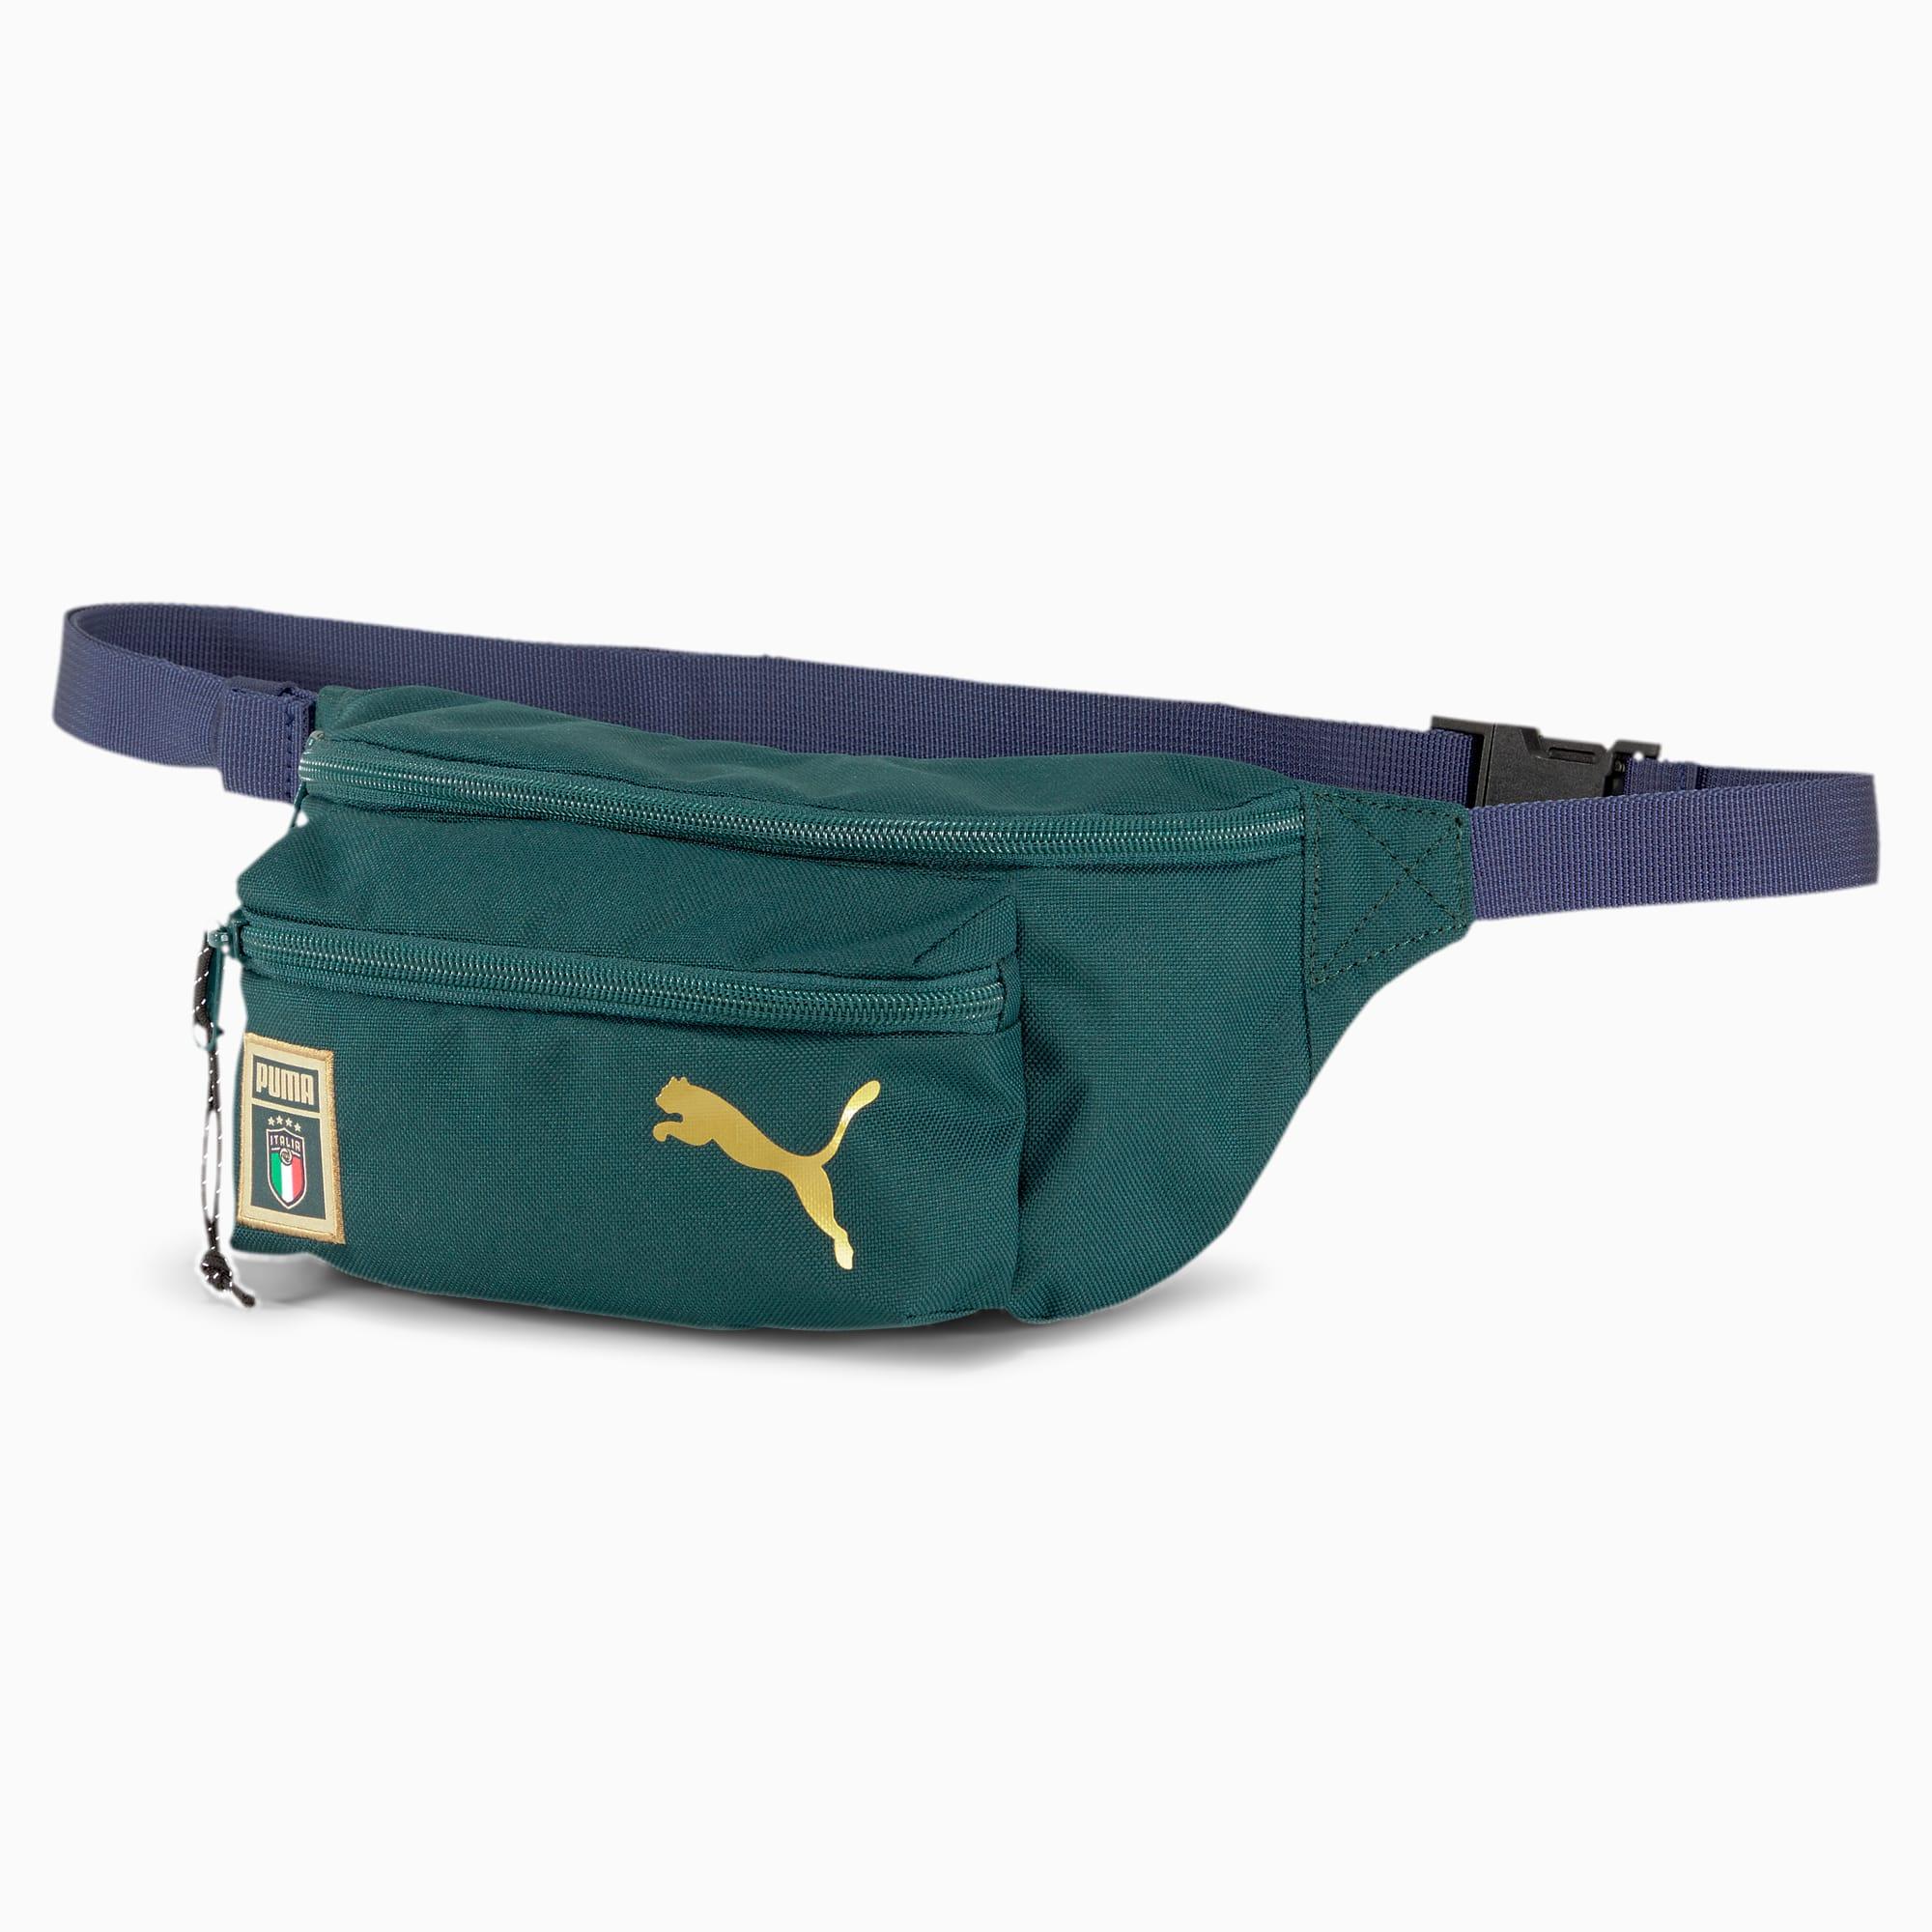 PUMA Italia DNA Lifestyle Waist Bag, Ponderosa Pine Peacoat, Akcesoria